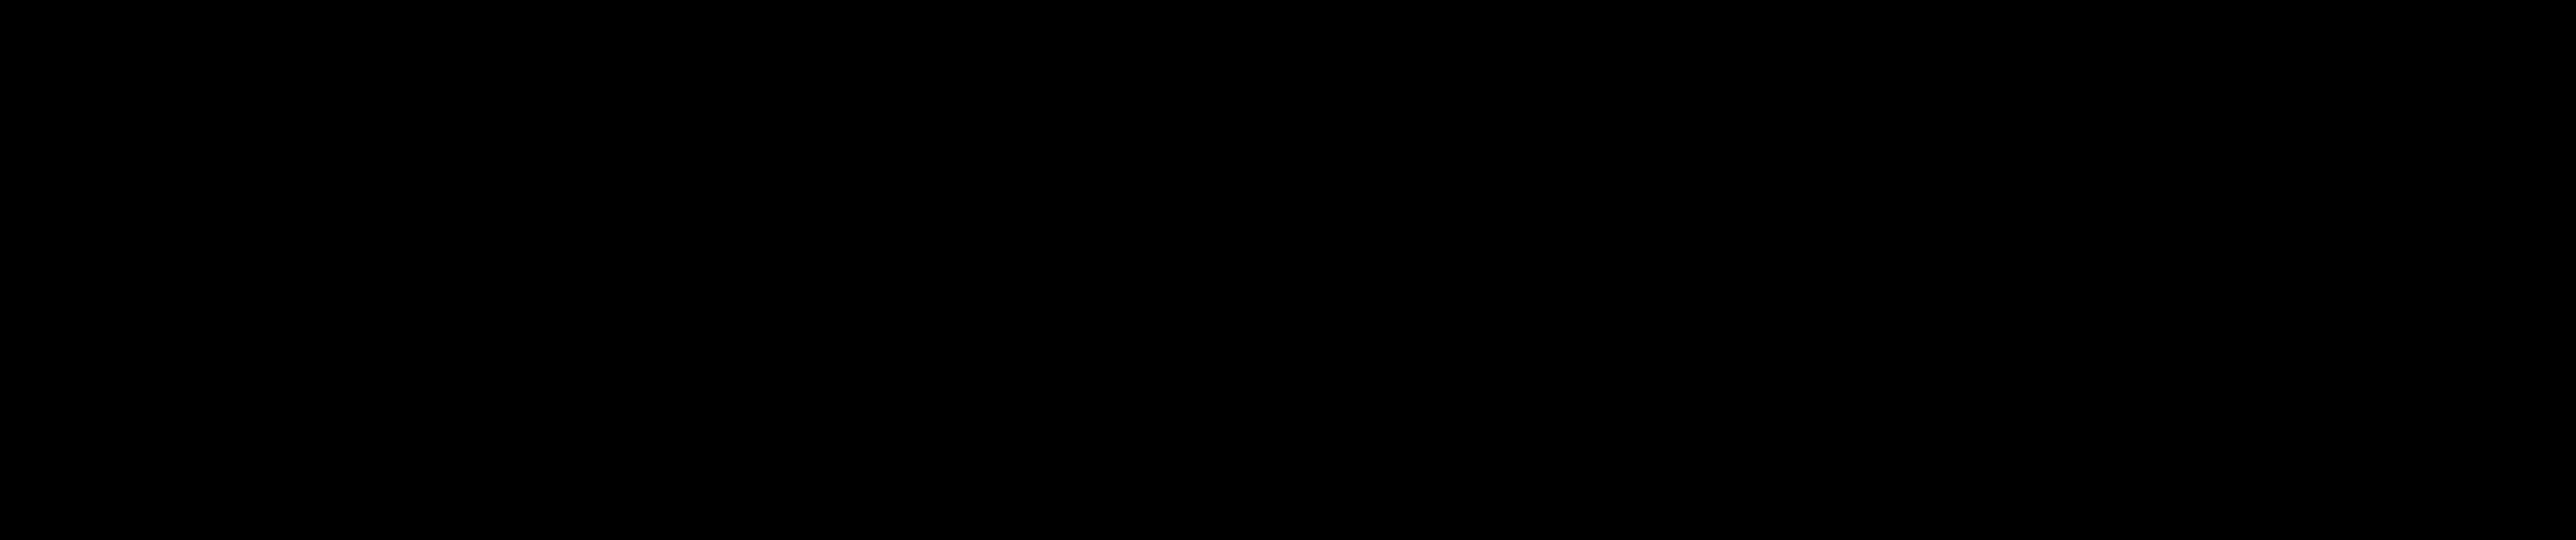 Zattini Logo.